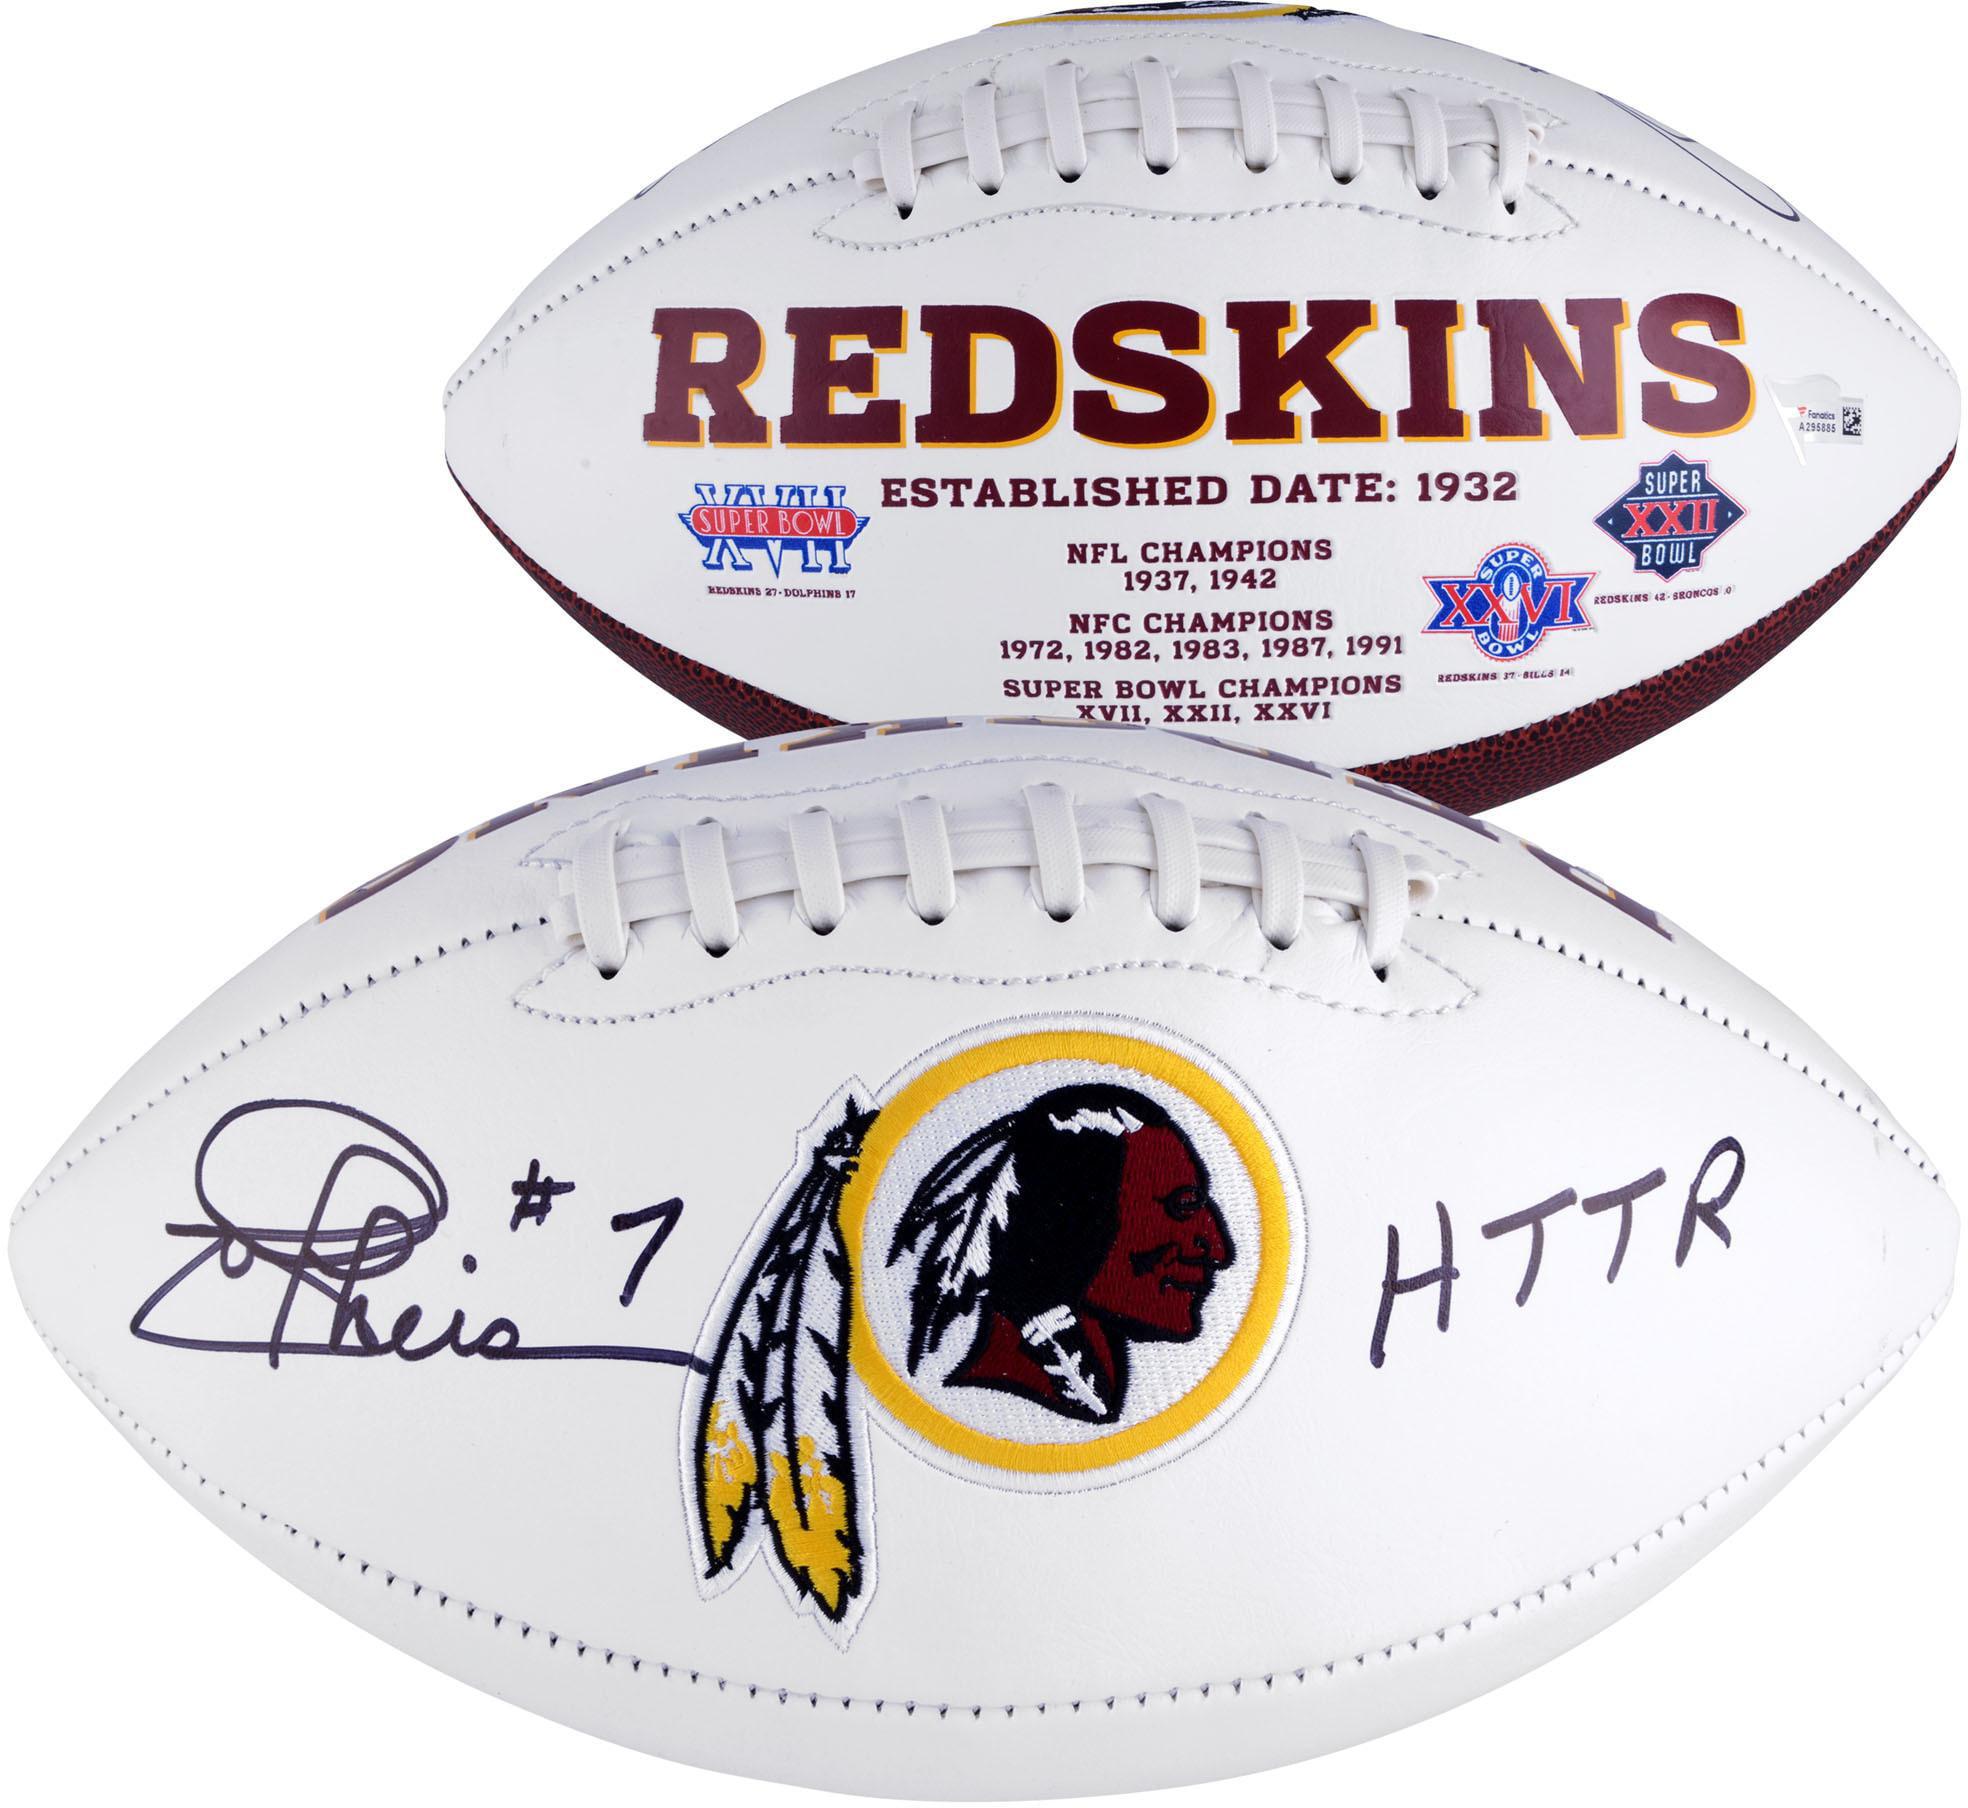 "Joe Theismann Washington Redskins Autographed White Panel Football with ""HTTR"" Inscription - Fanatics Authentic Certified"